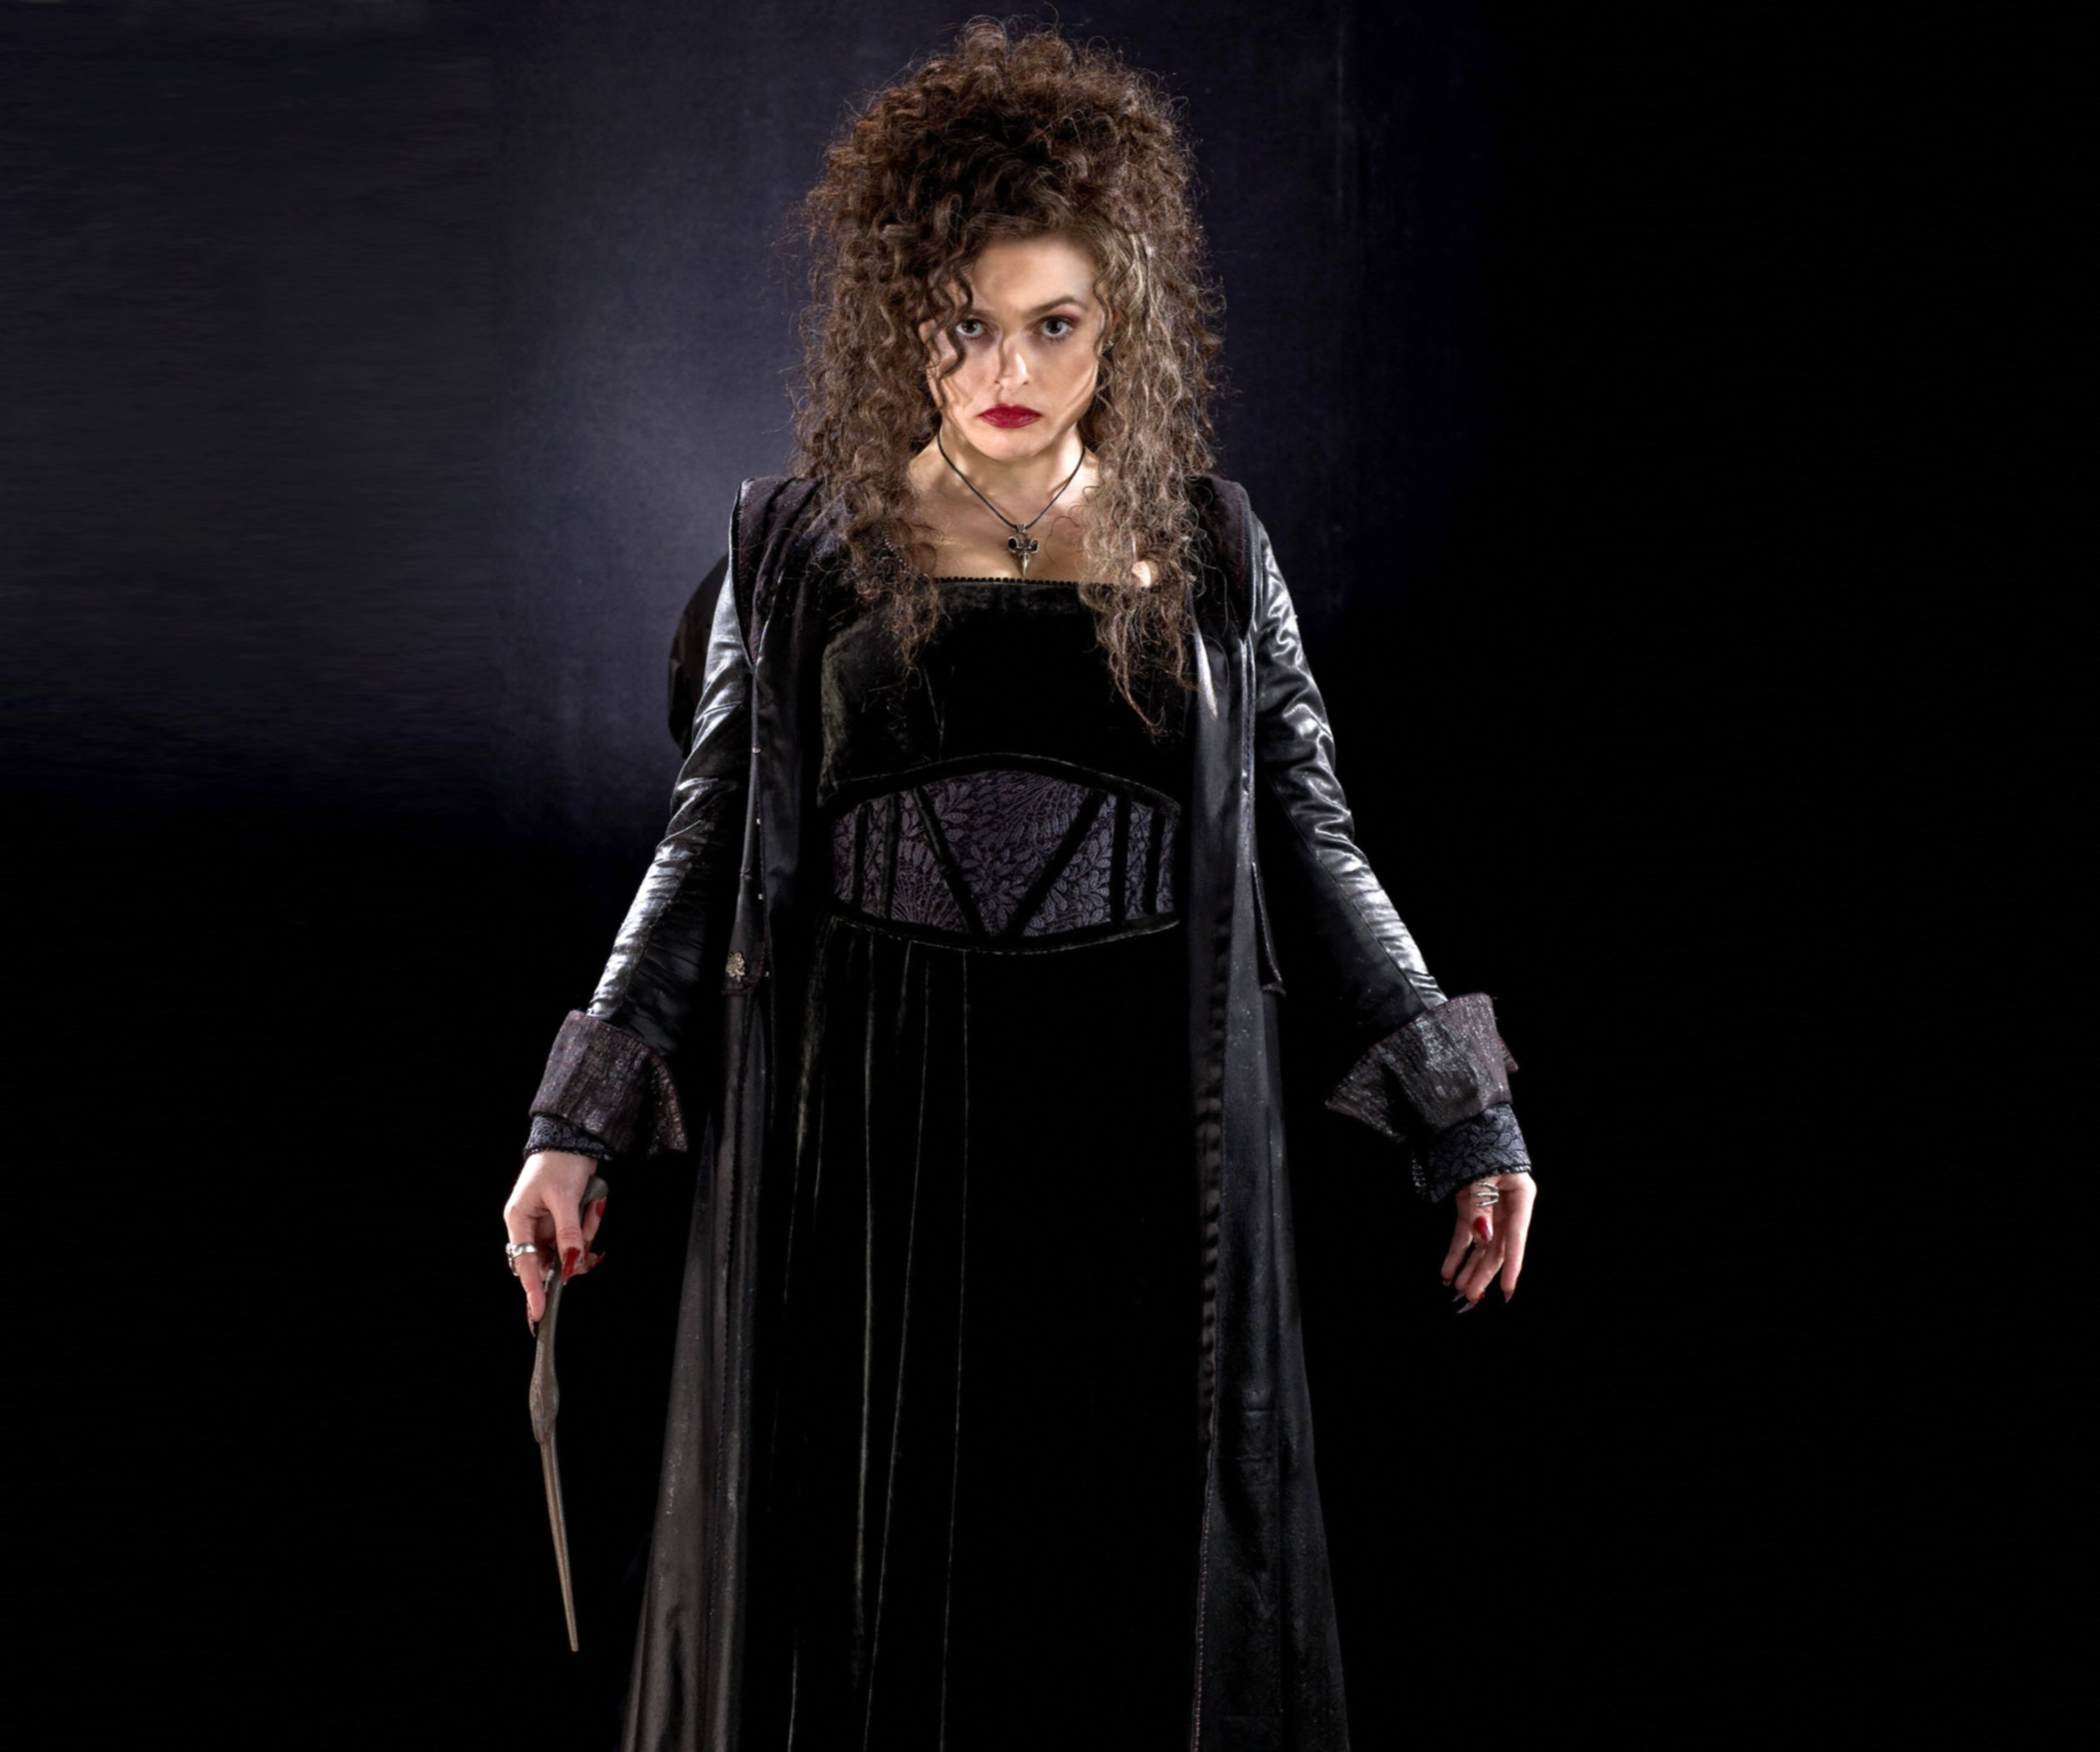 Every time Bellatrix Lestrange gave us nightmares